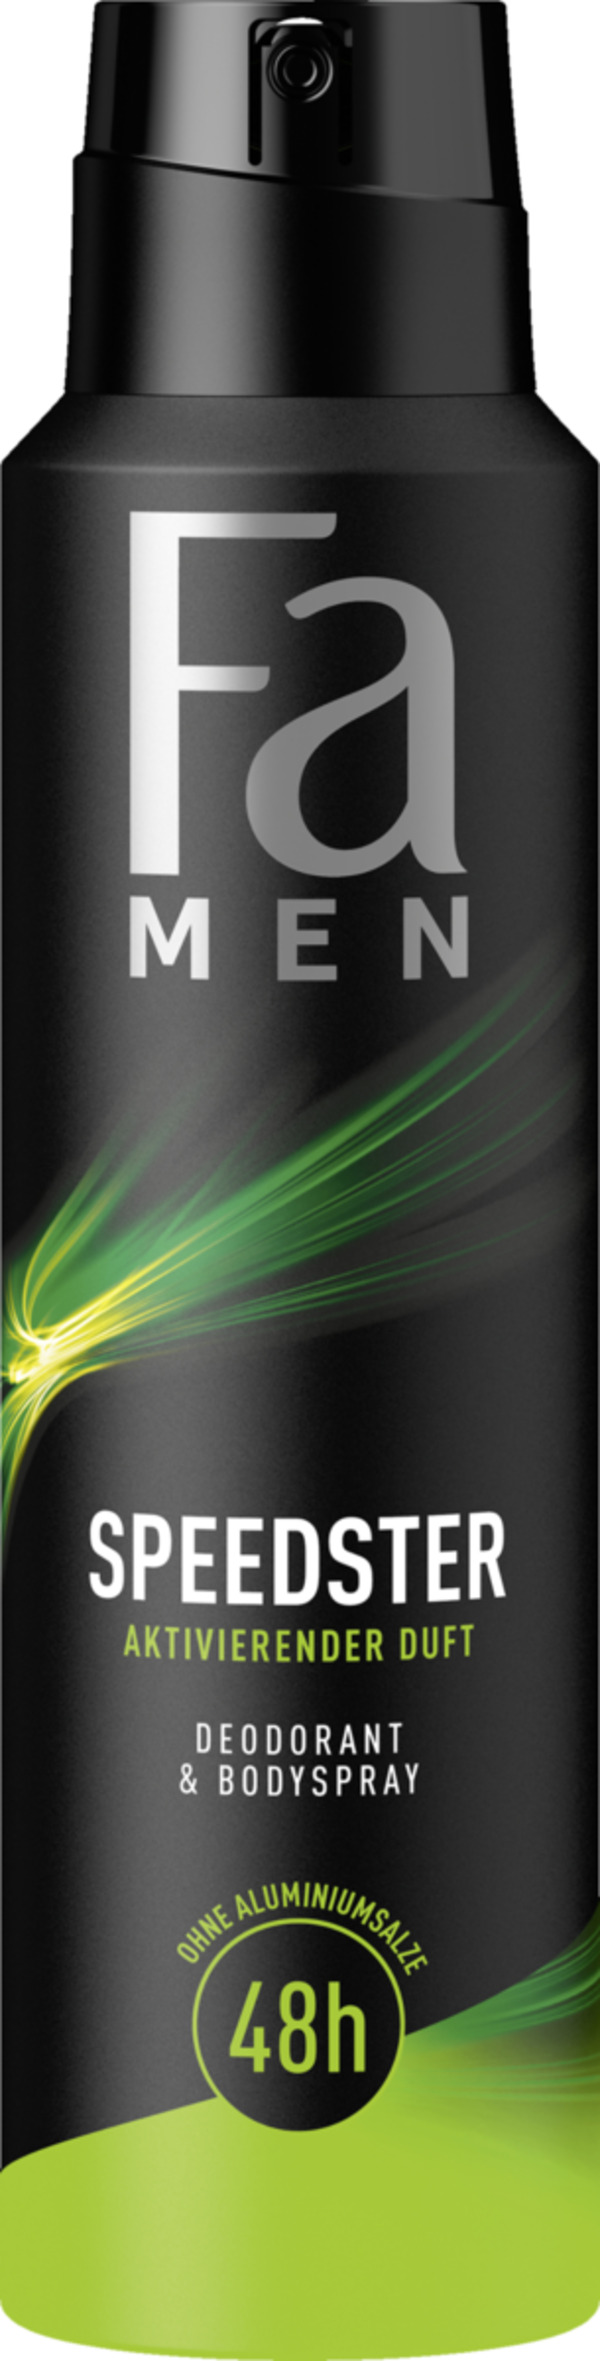 Fa Speedster Deodorant Spray Men